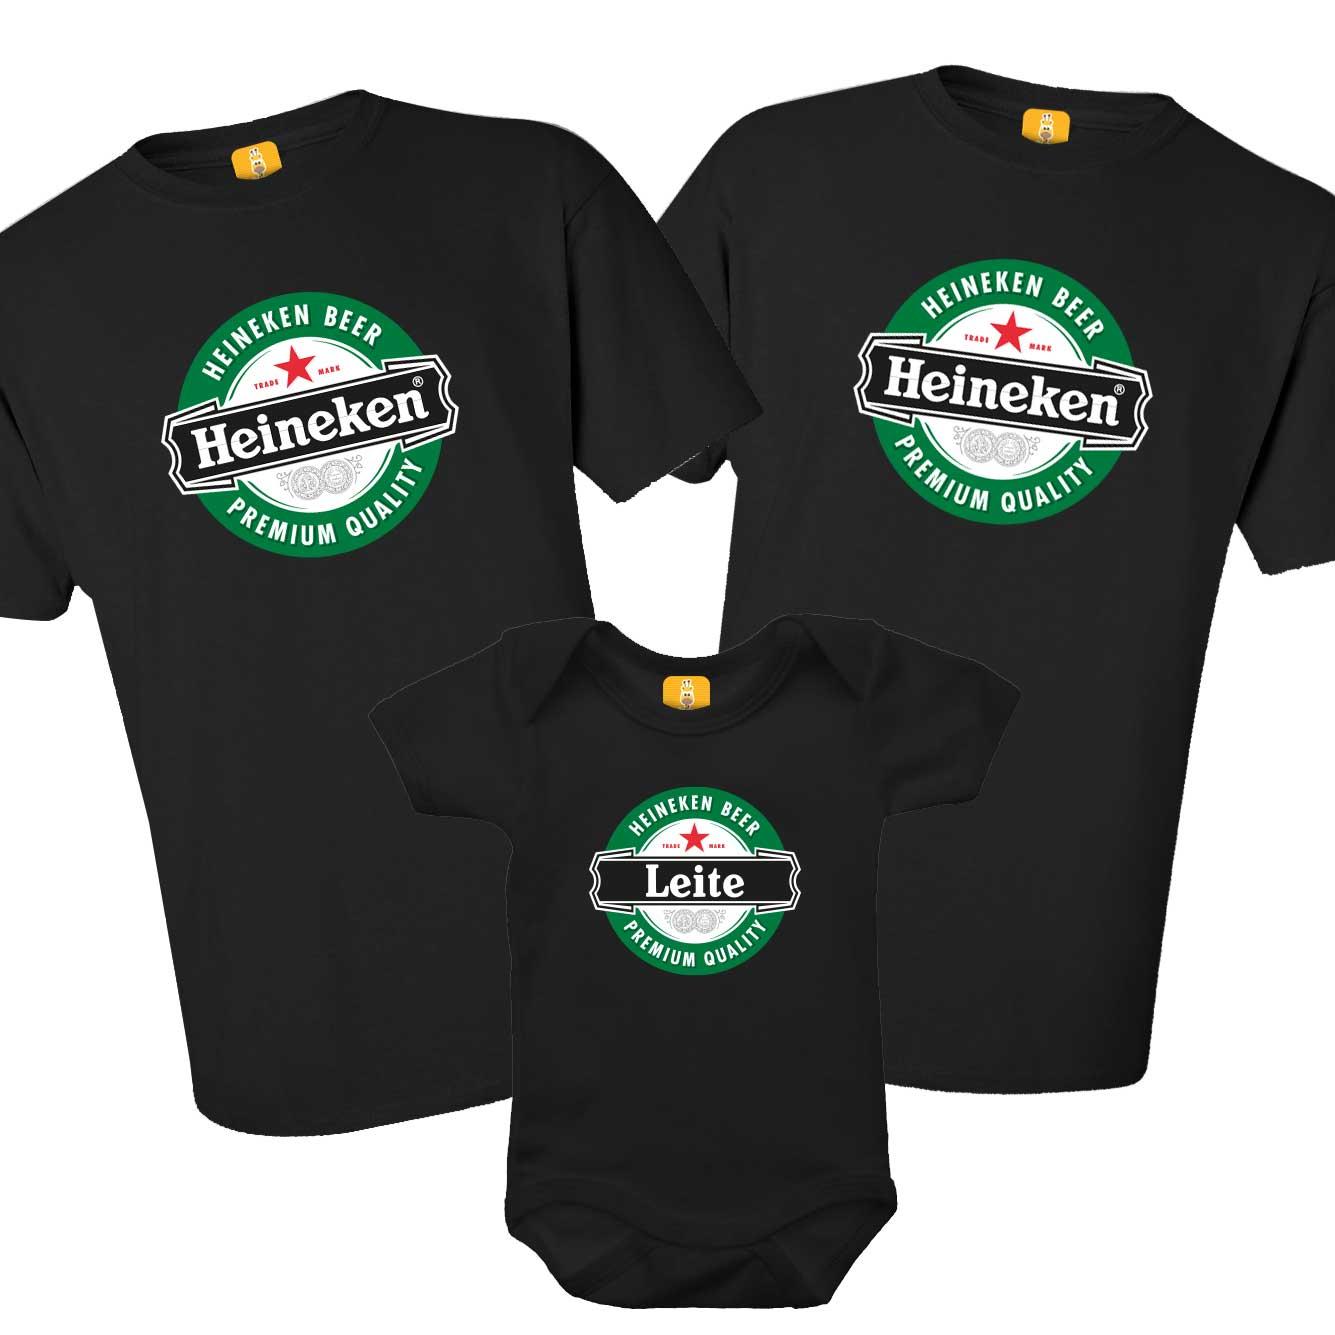 Kit Camiseta e Body - Heineken 3 peças